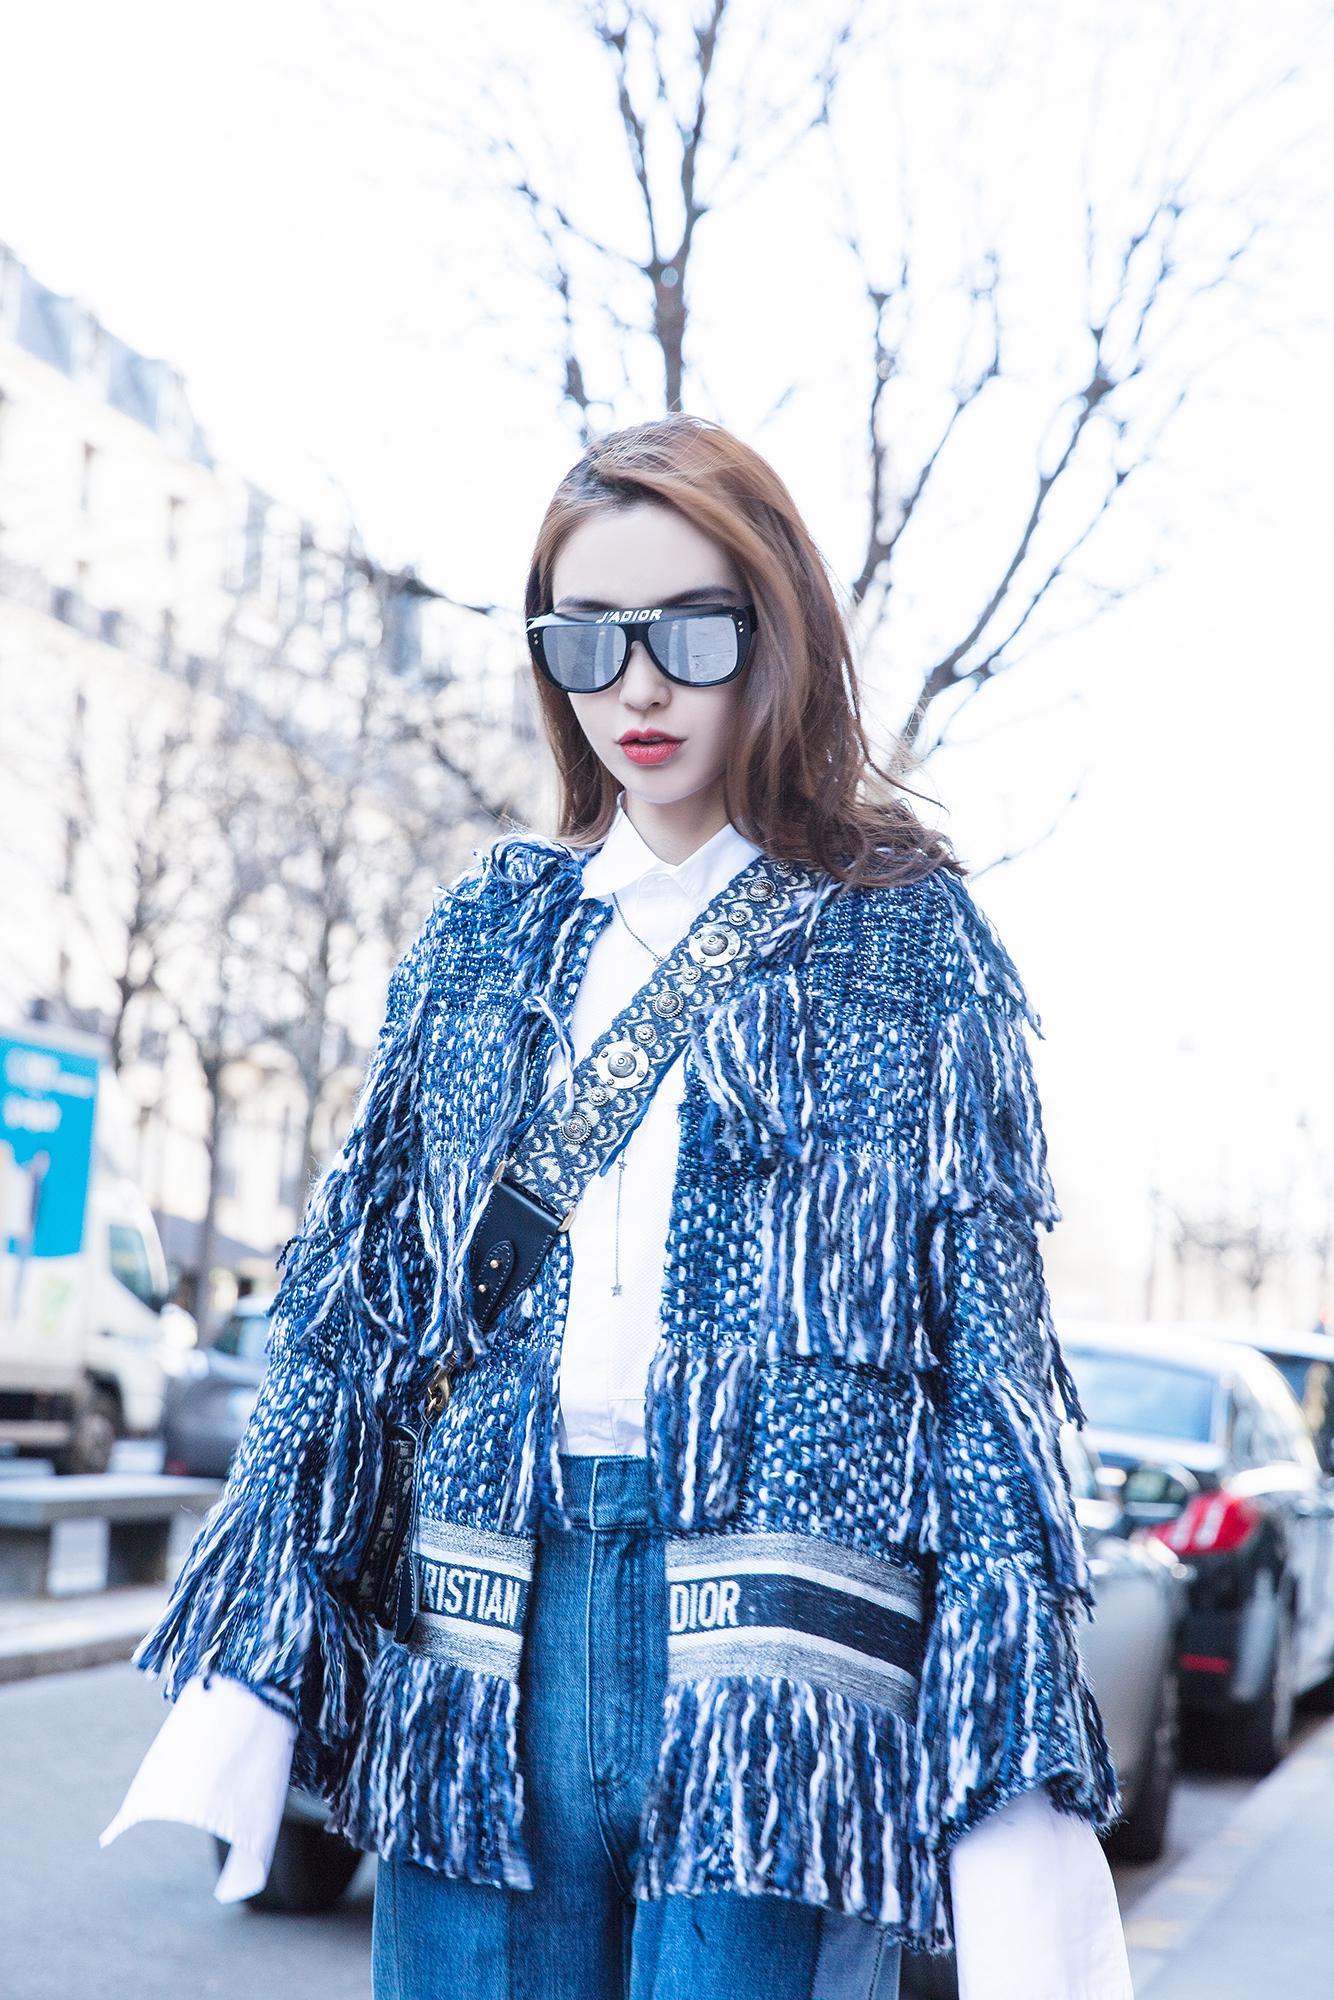 Angelababy现身巴黎街头 轻松牛仔风演绎春日酷女孩